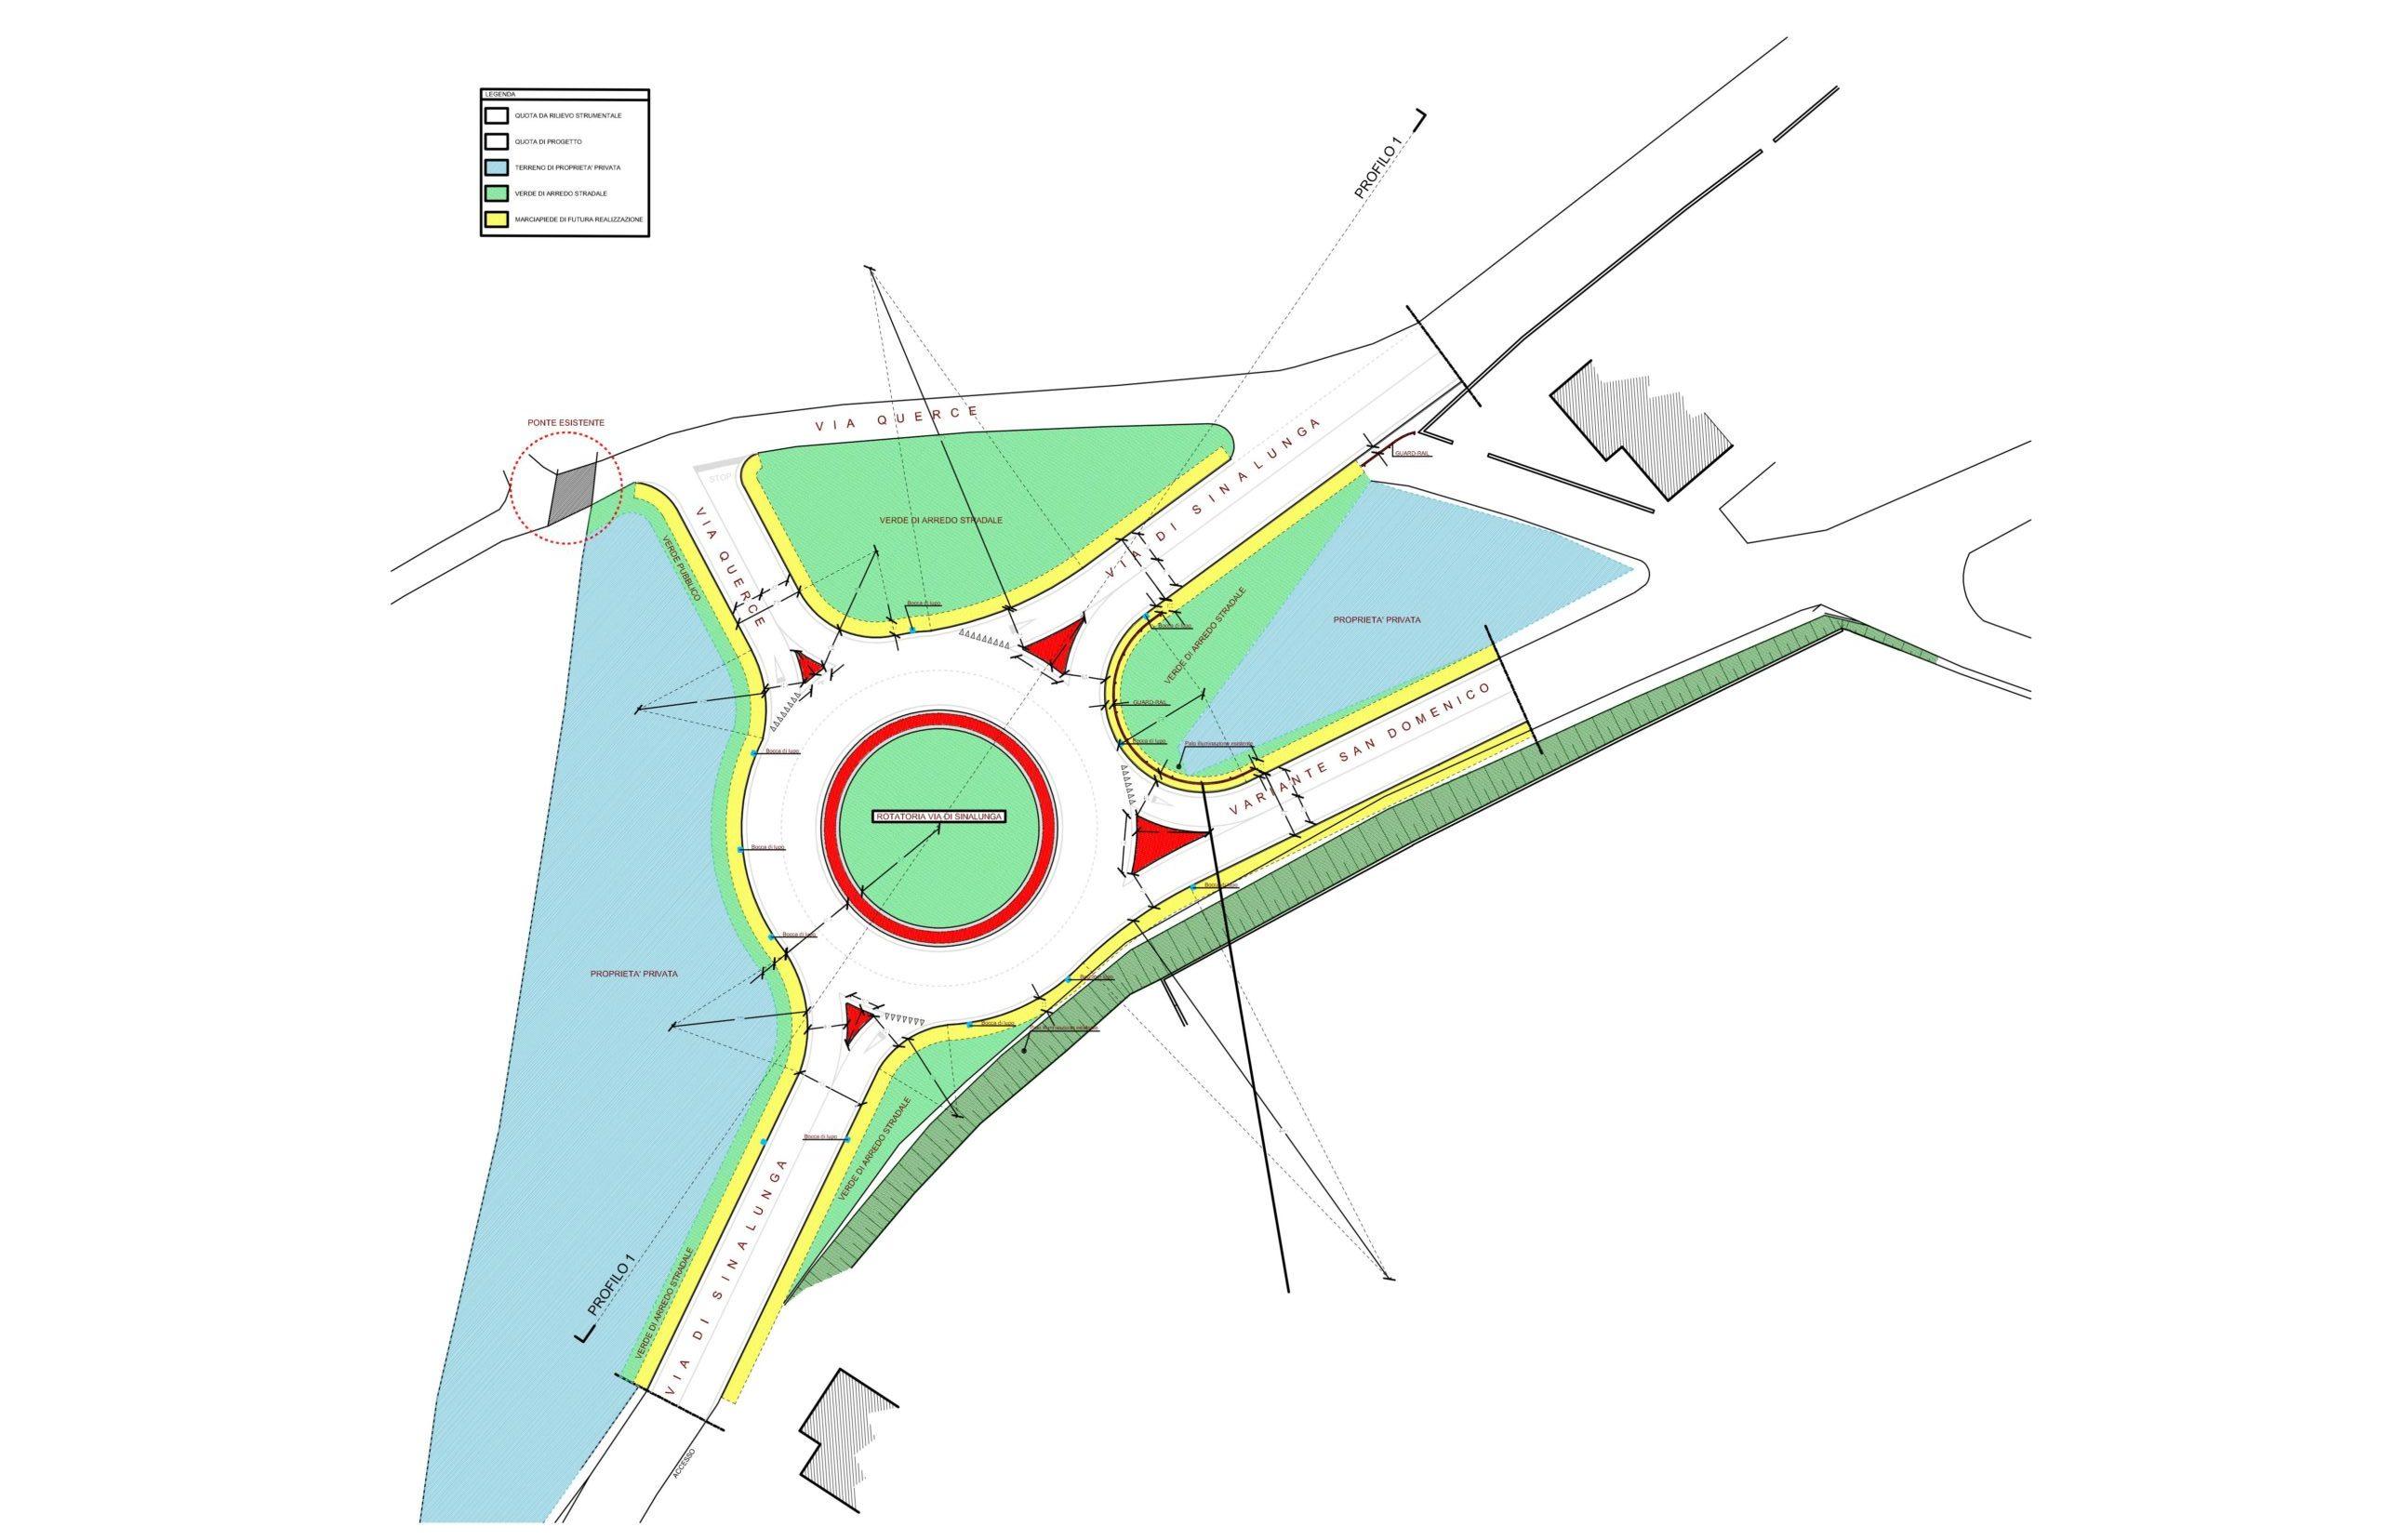 Nuova rotatoria a Foiano all'incrocio tra via di Sinalunga e Variante San Domenico